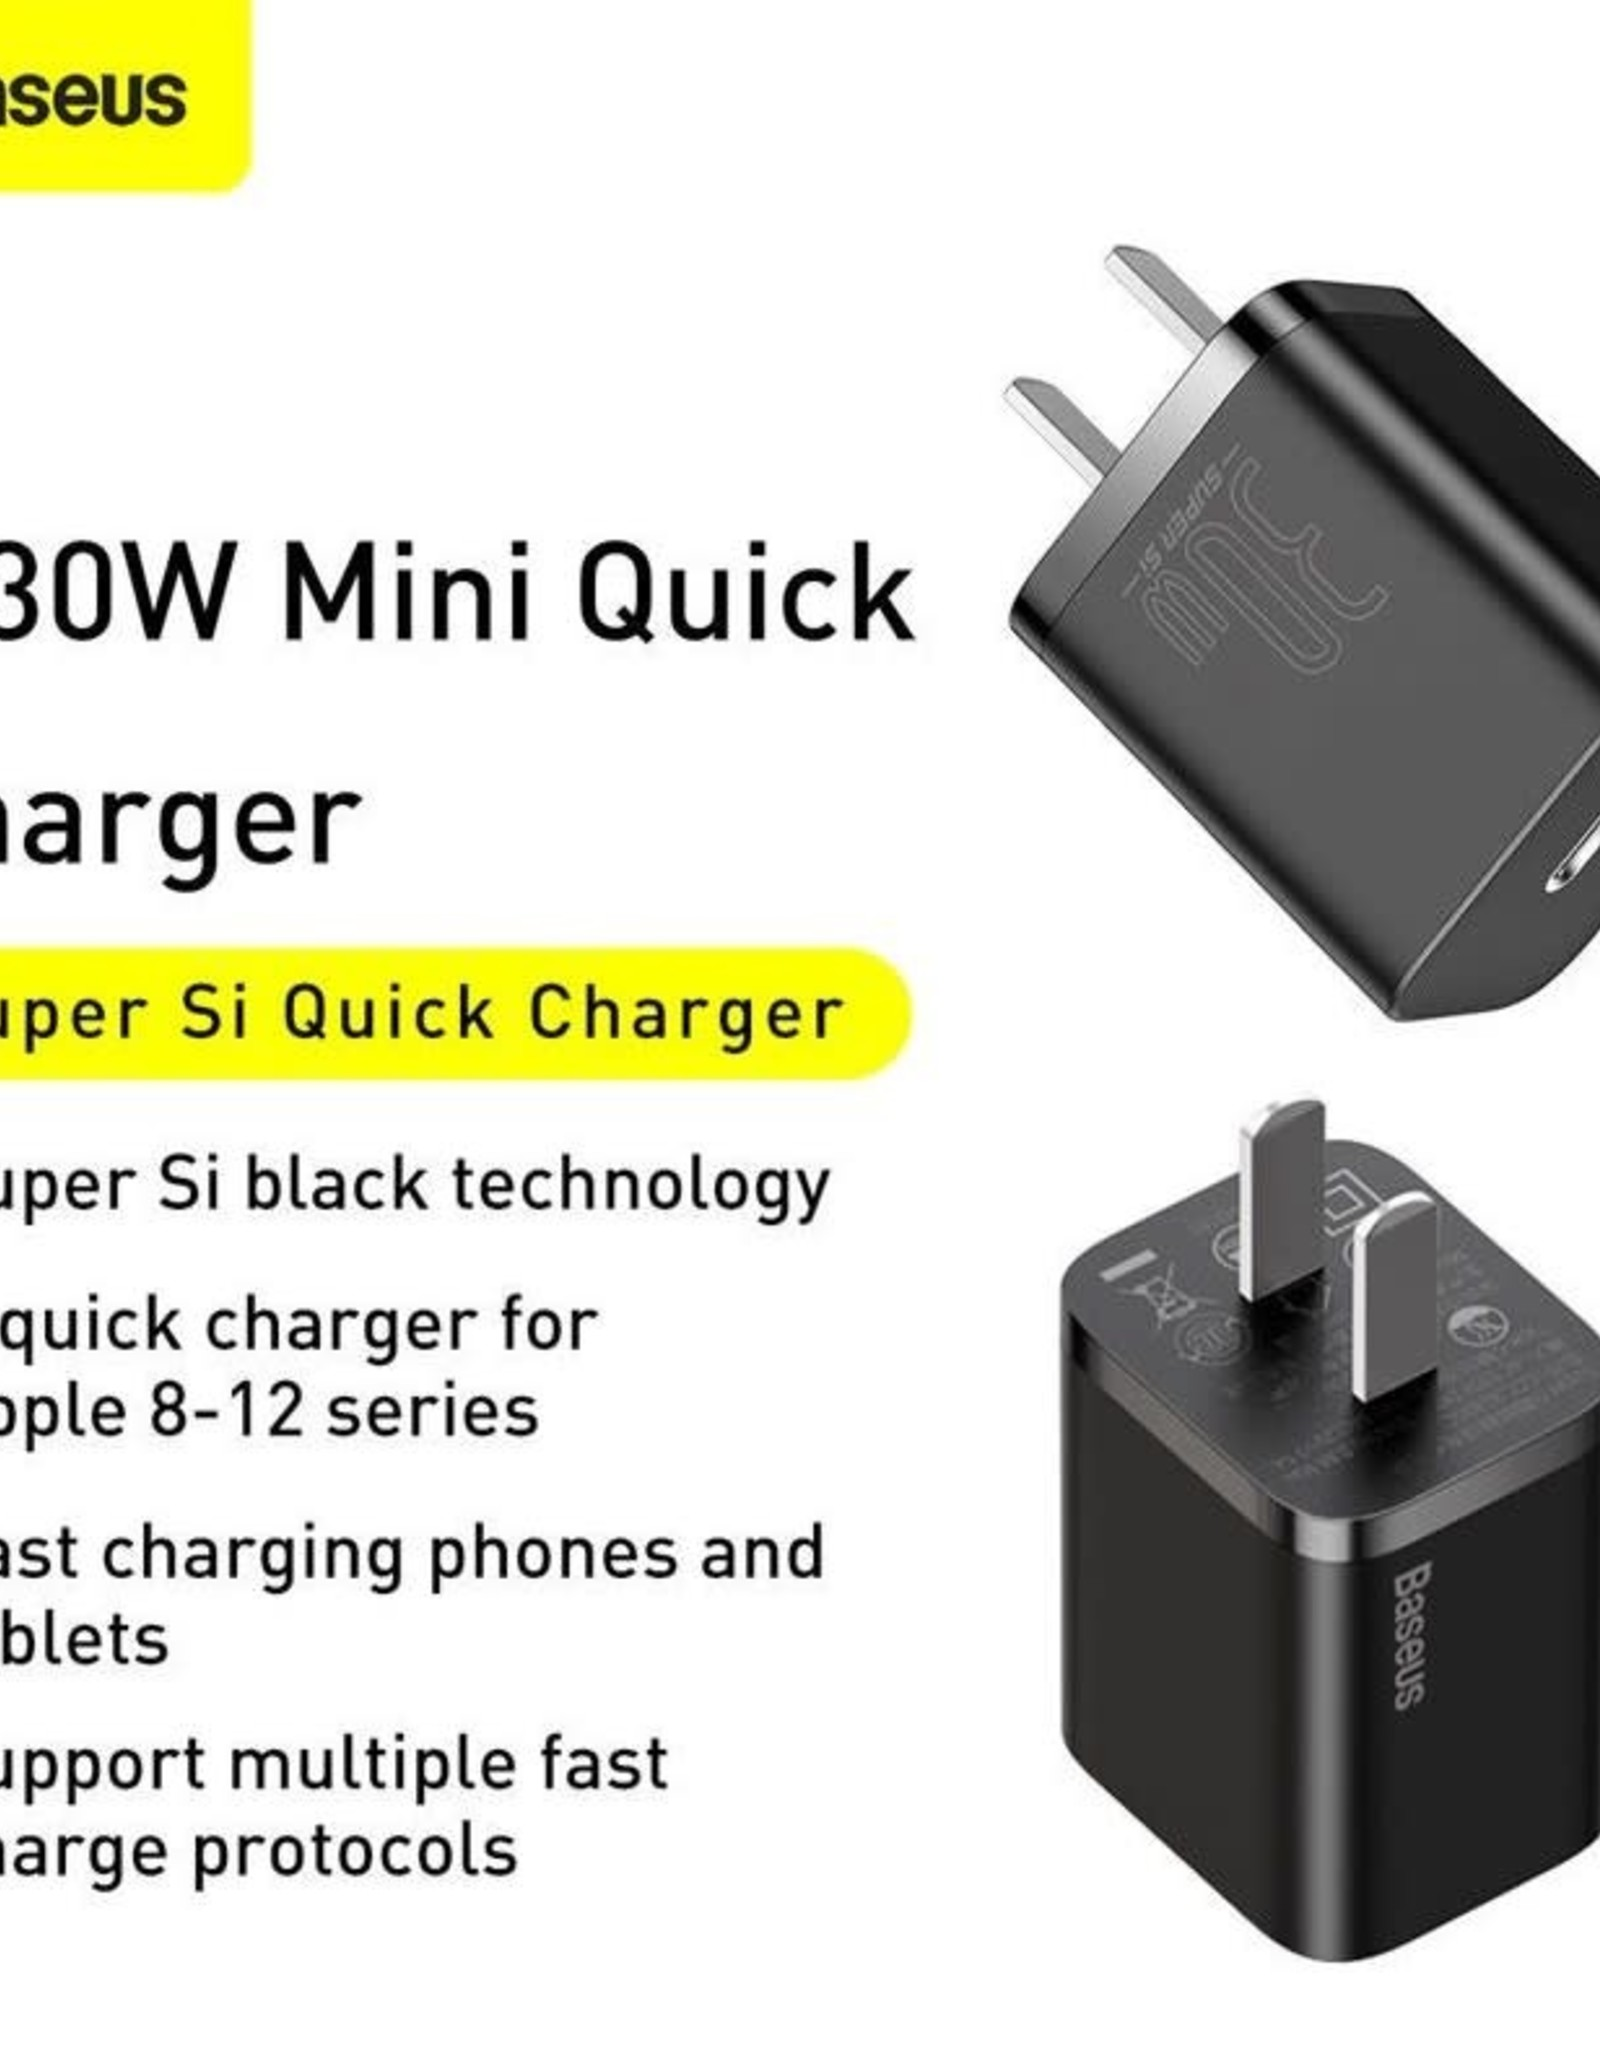 Baseus Baseus Super Si quick charger IC 30W CN Black